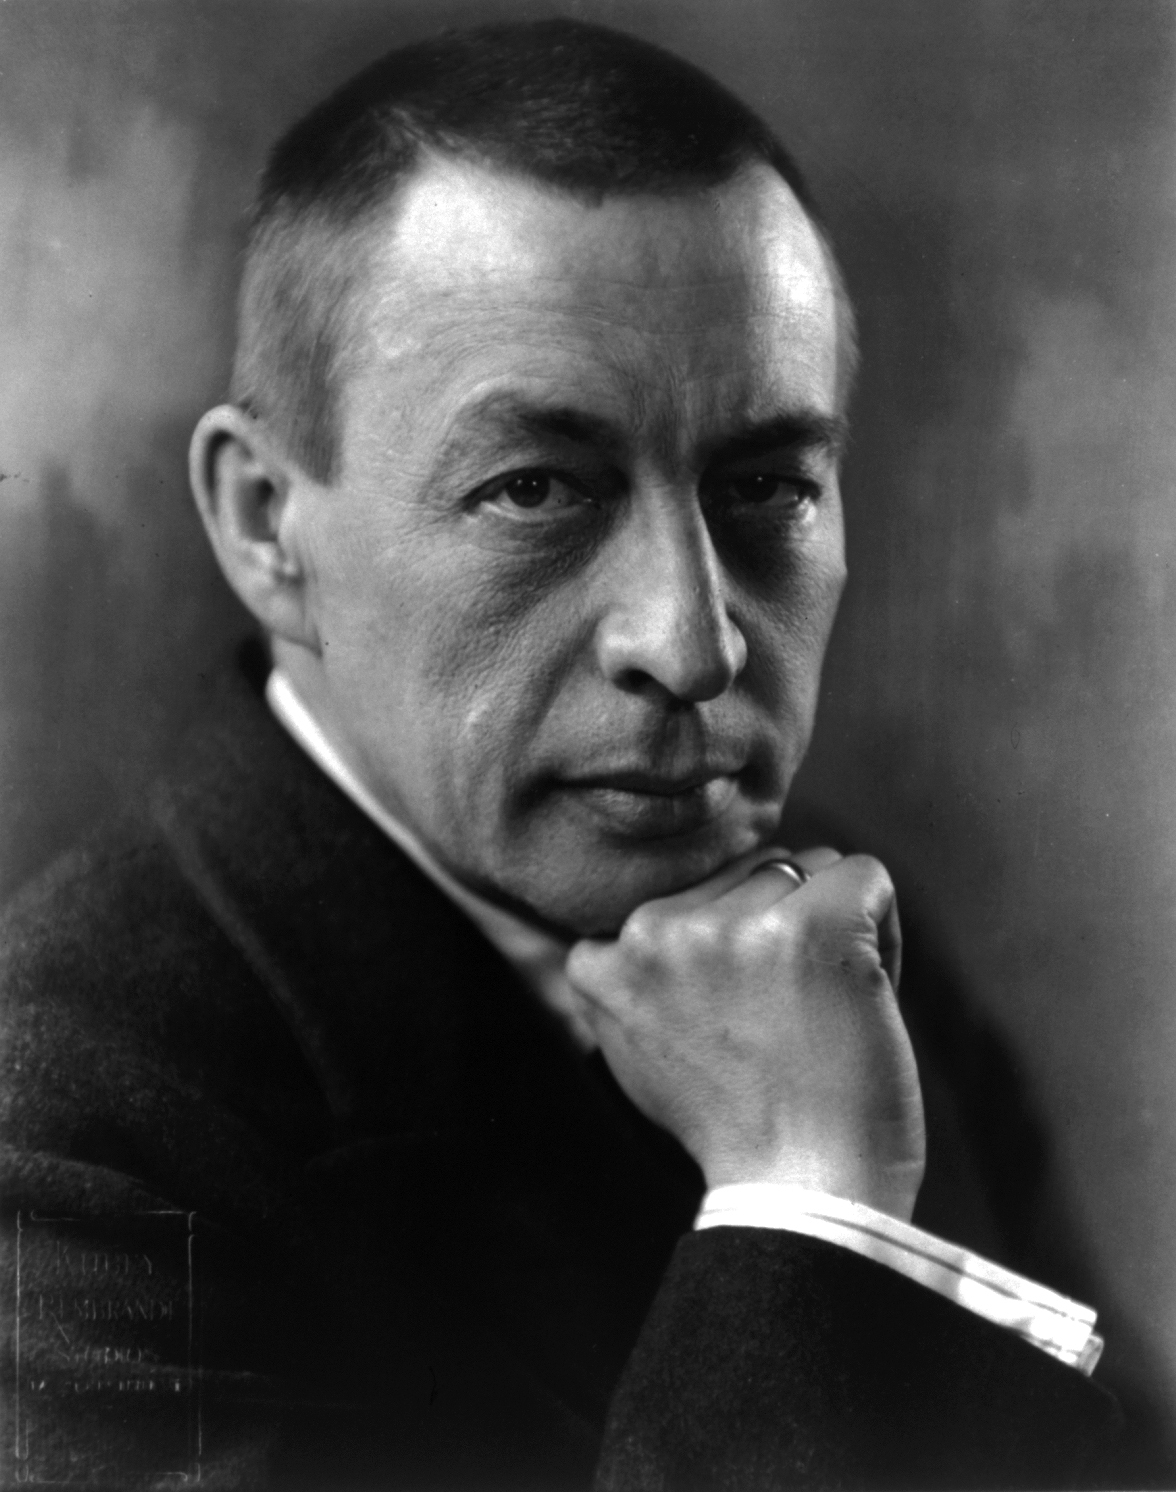 Sergei_Rachmaninoff_cph.3a40575[1].jpg